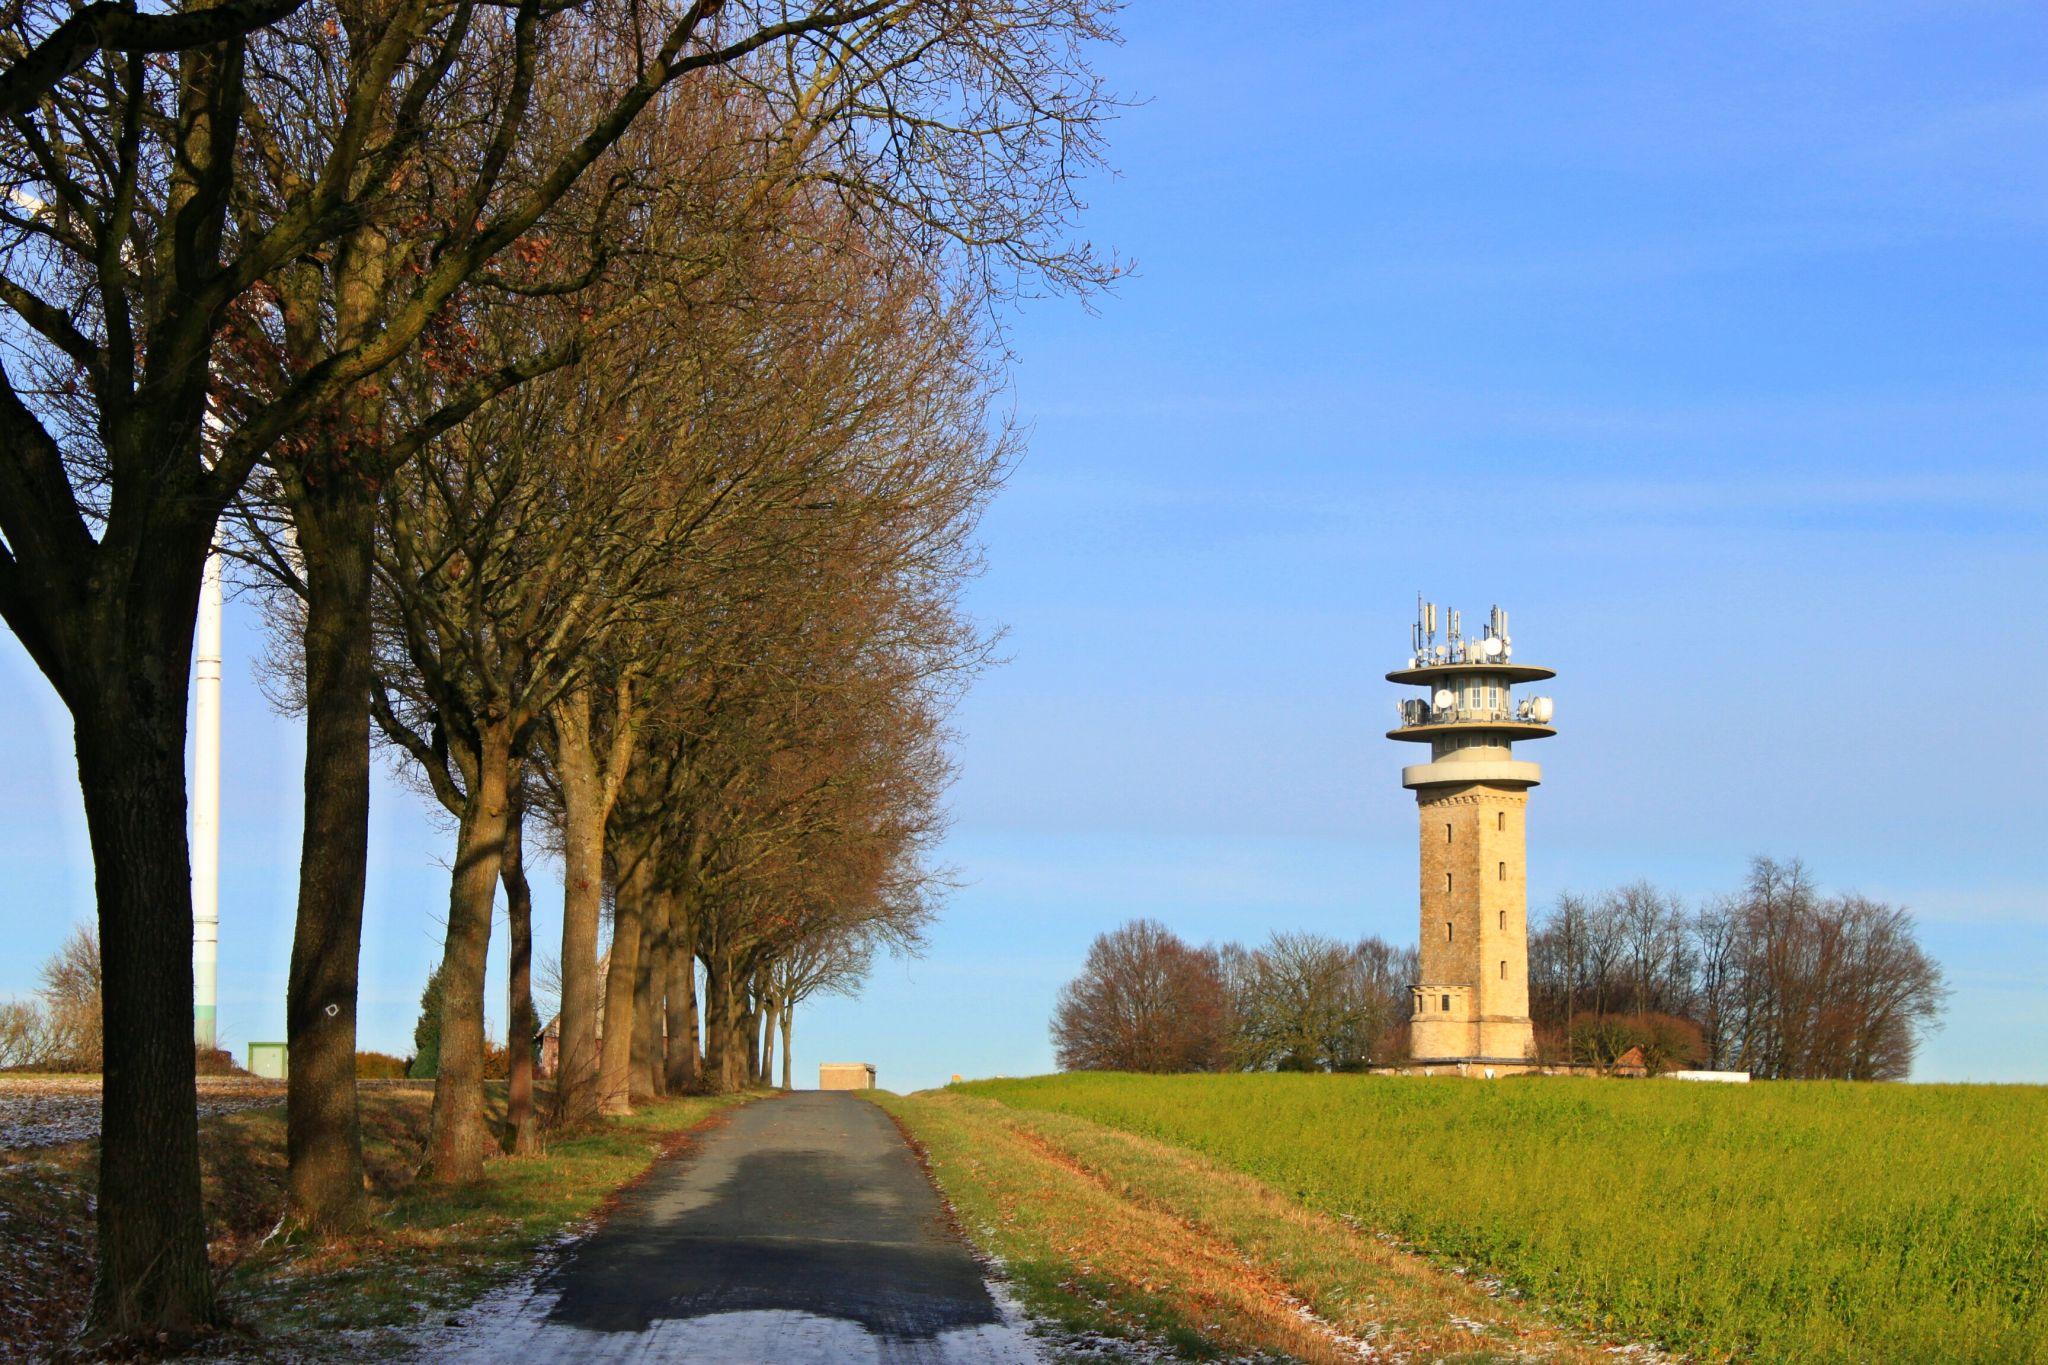 Longinus Tower on the Baumberg, Germany